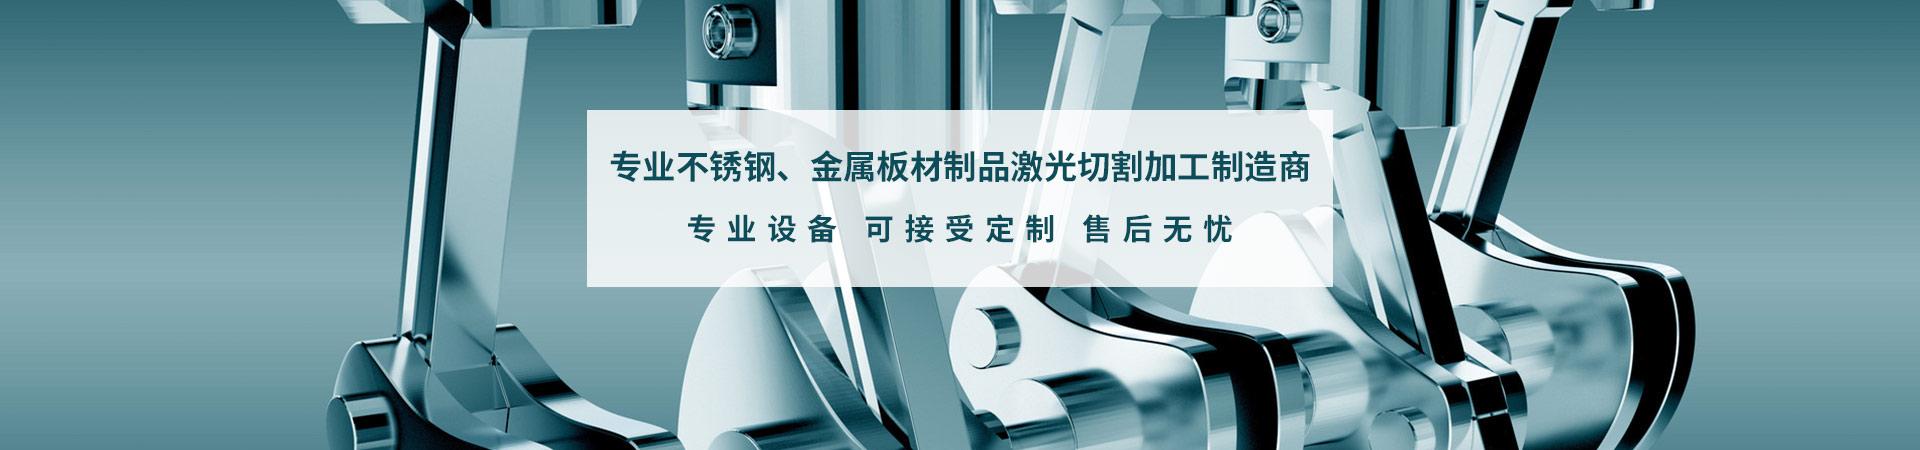 http://www.qianchangmetal.com/data/upload/202010/20201022182524_313.jpg